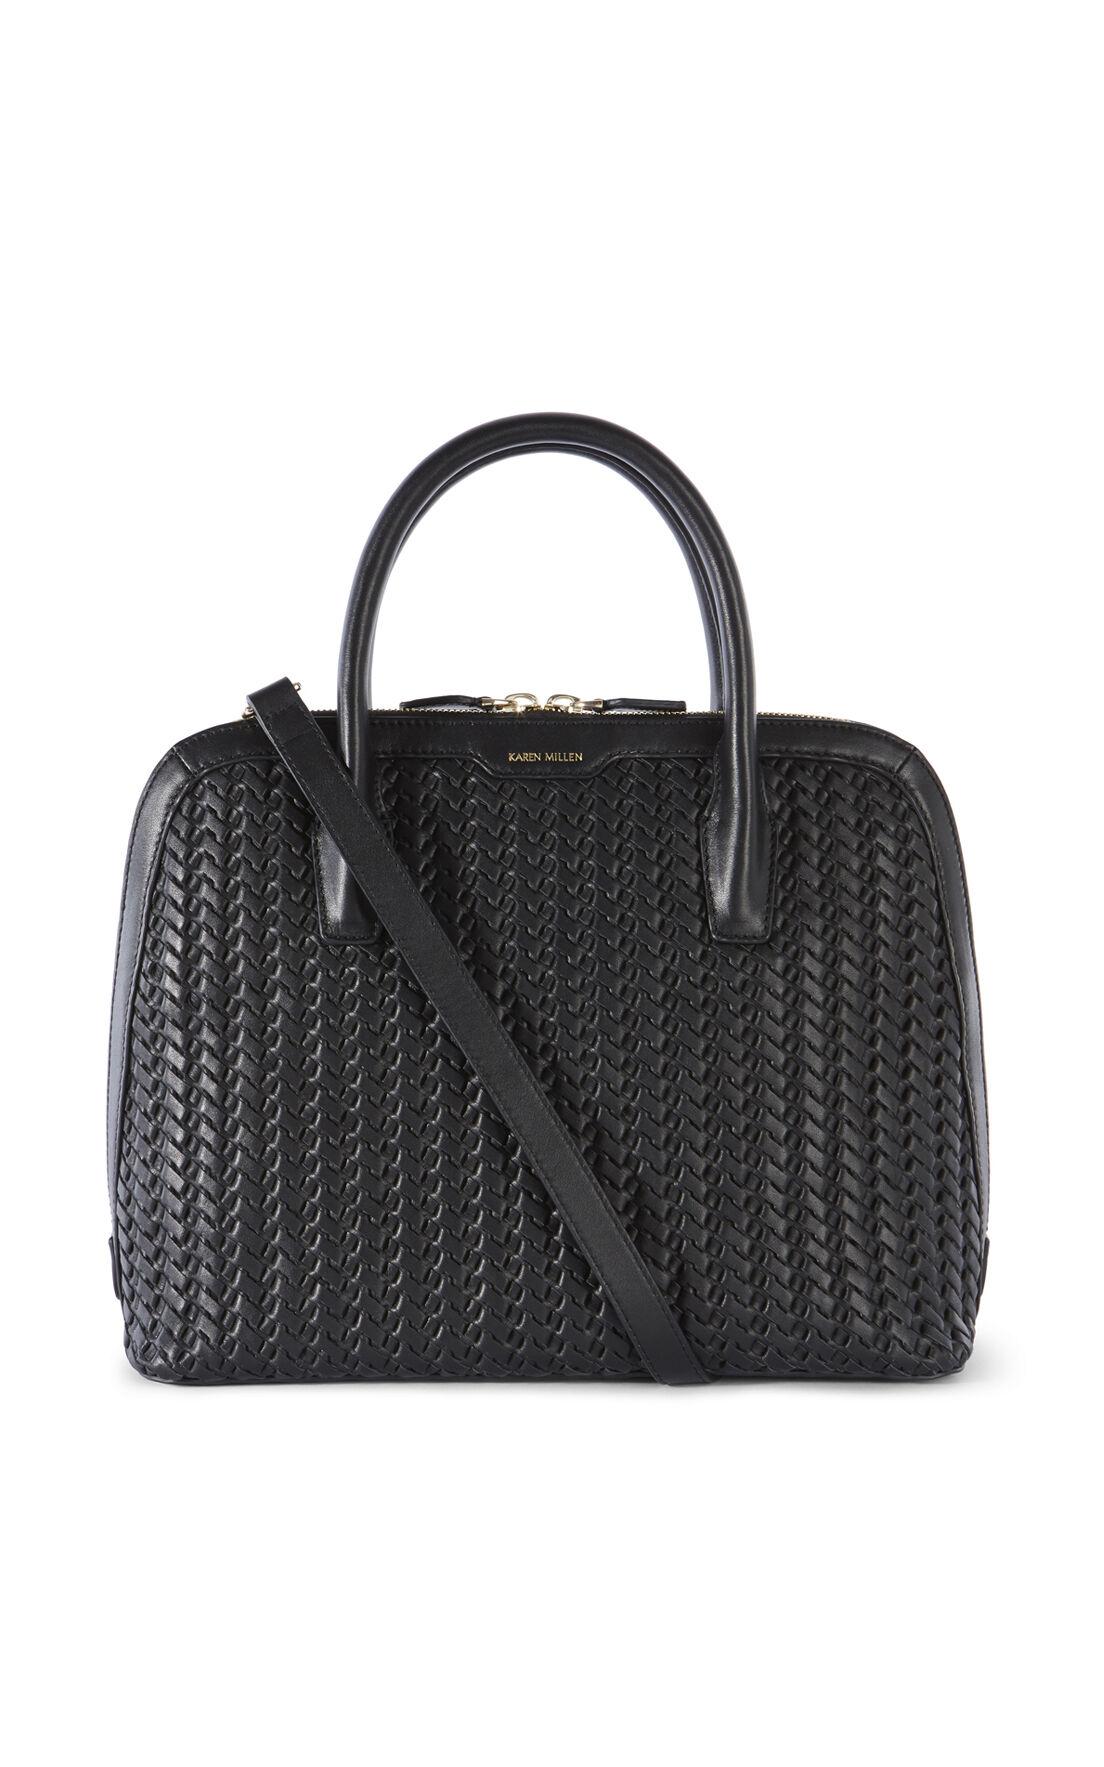 Karen Millen, WOVEN LEATHER BAG Black 0